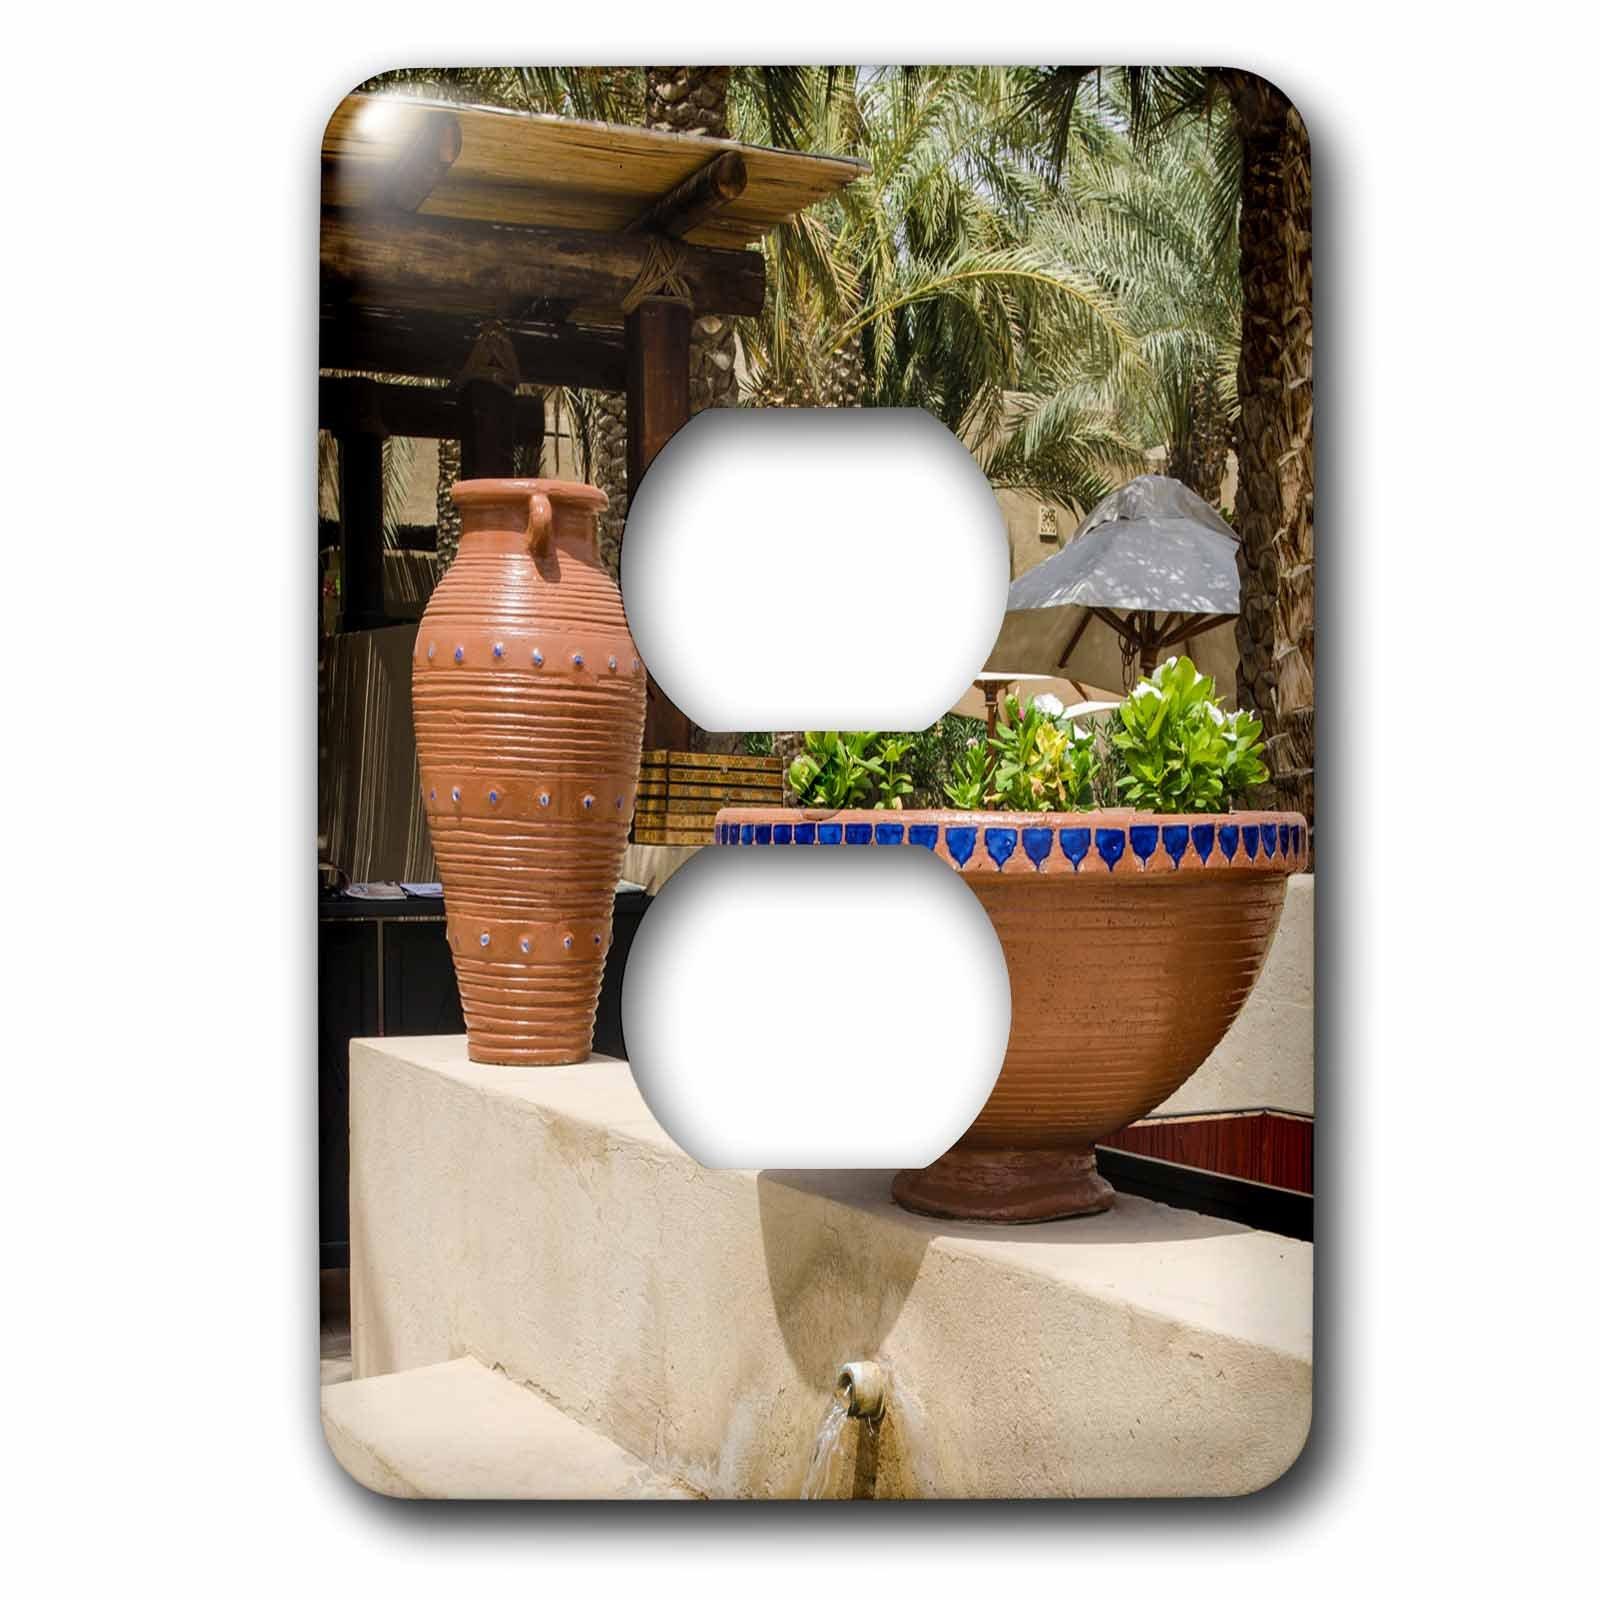 3dRose (6) 2 Plug Outlet Cover (lsp_226130_6) 2 Resort and Spa. Dubai, United Arab Emirates.